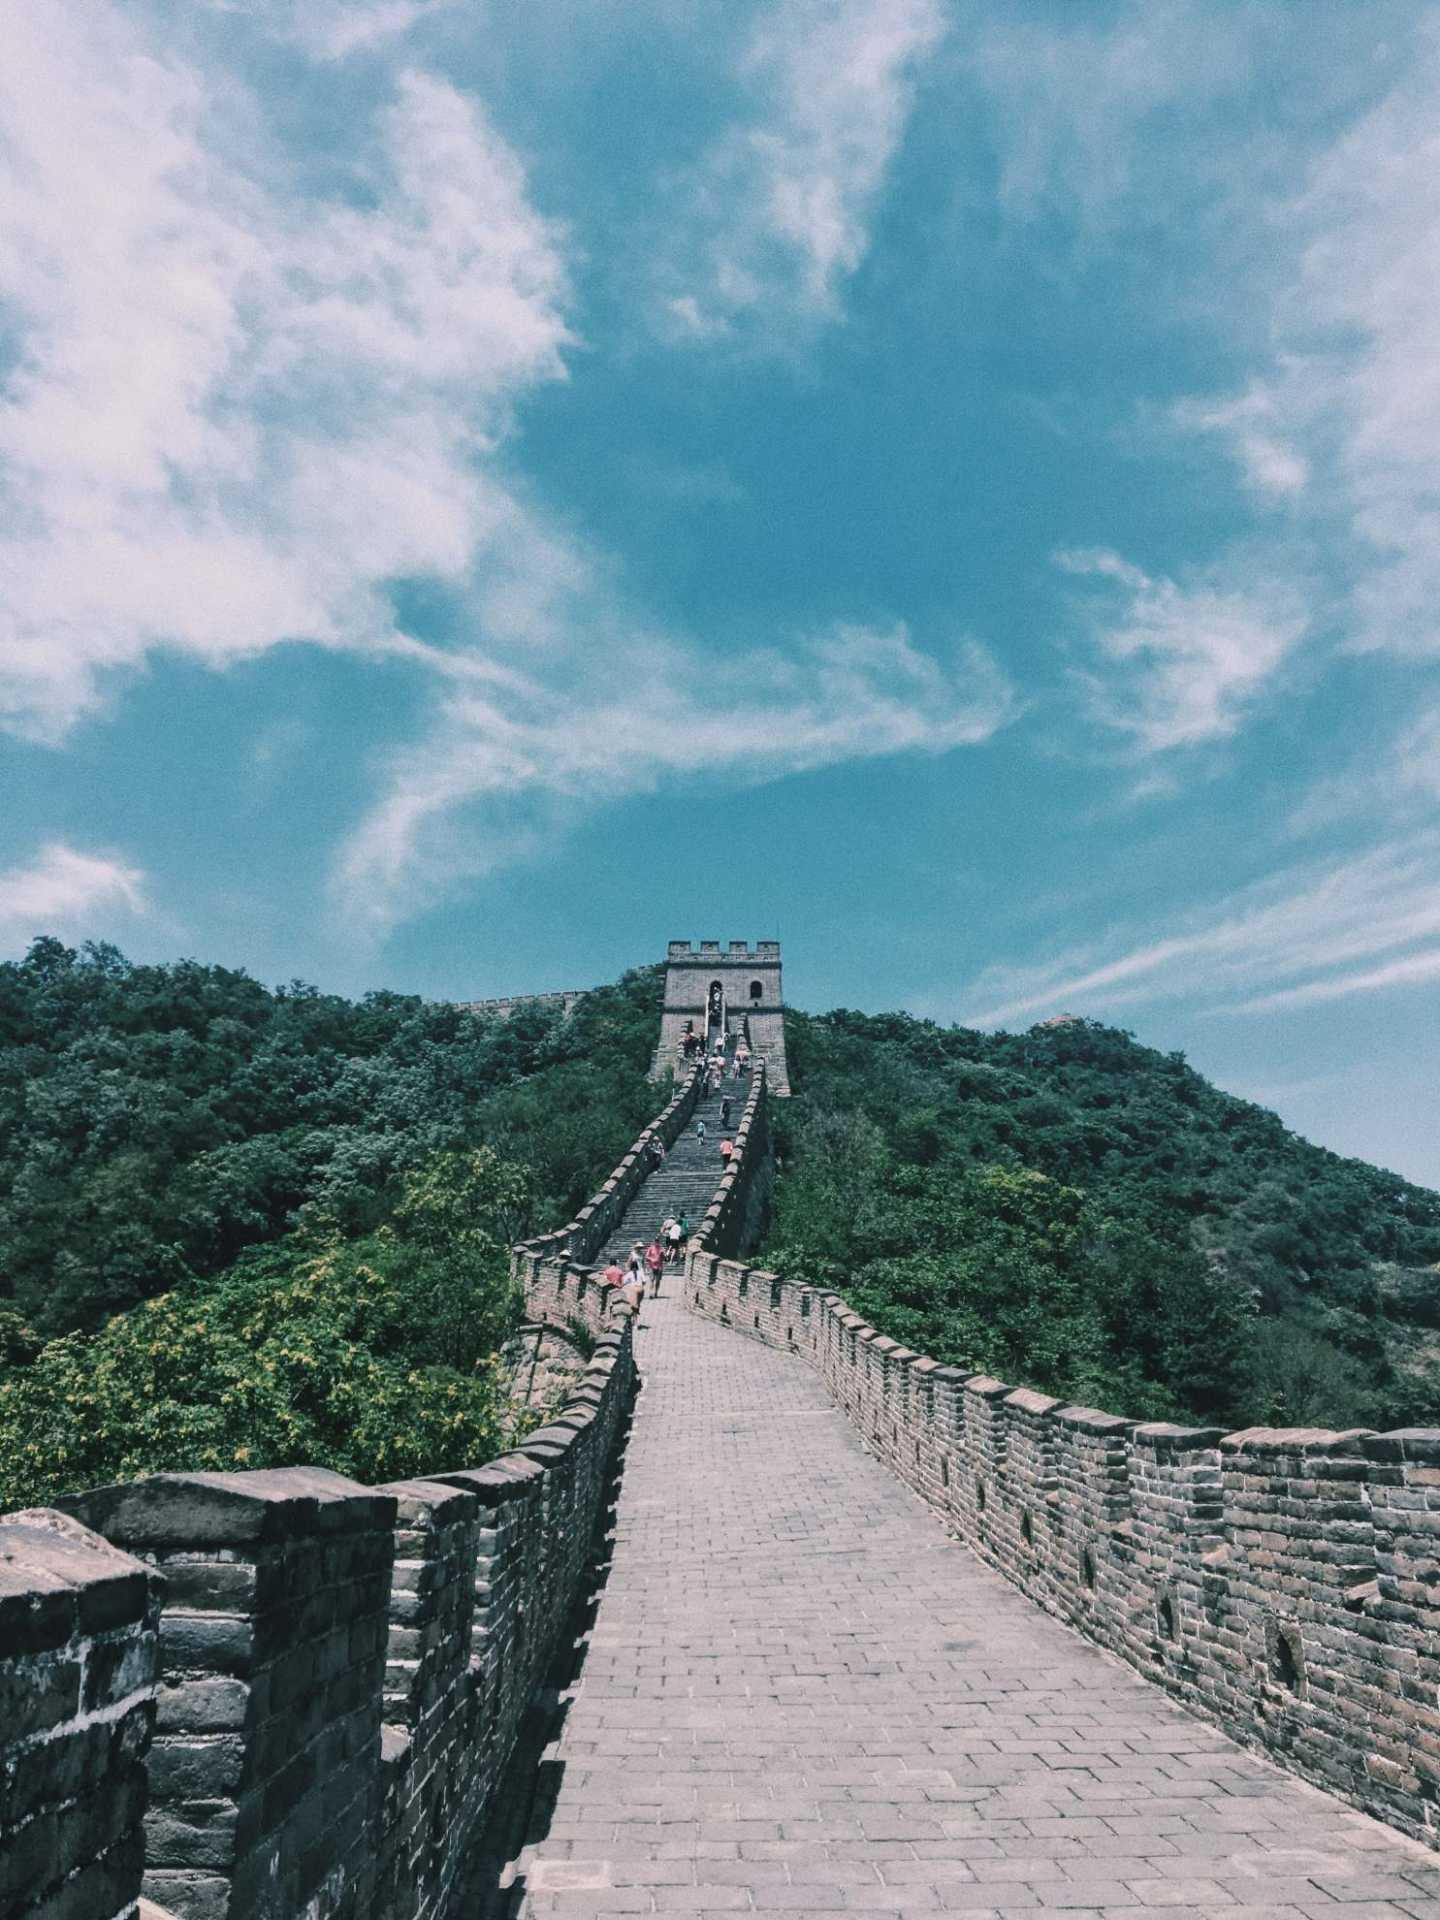 mikaela wiedenhoff d0VxLuvjUJA unsplash - Studia w Chinach